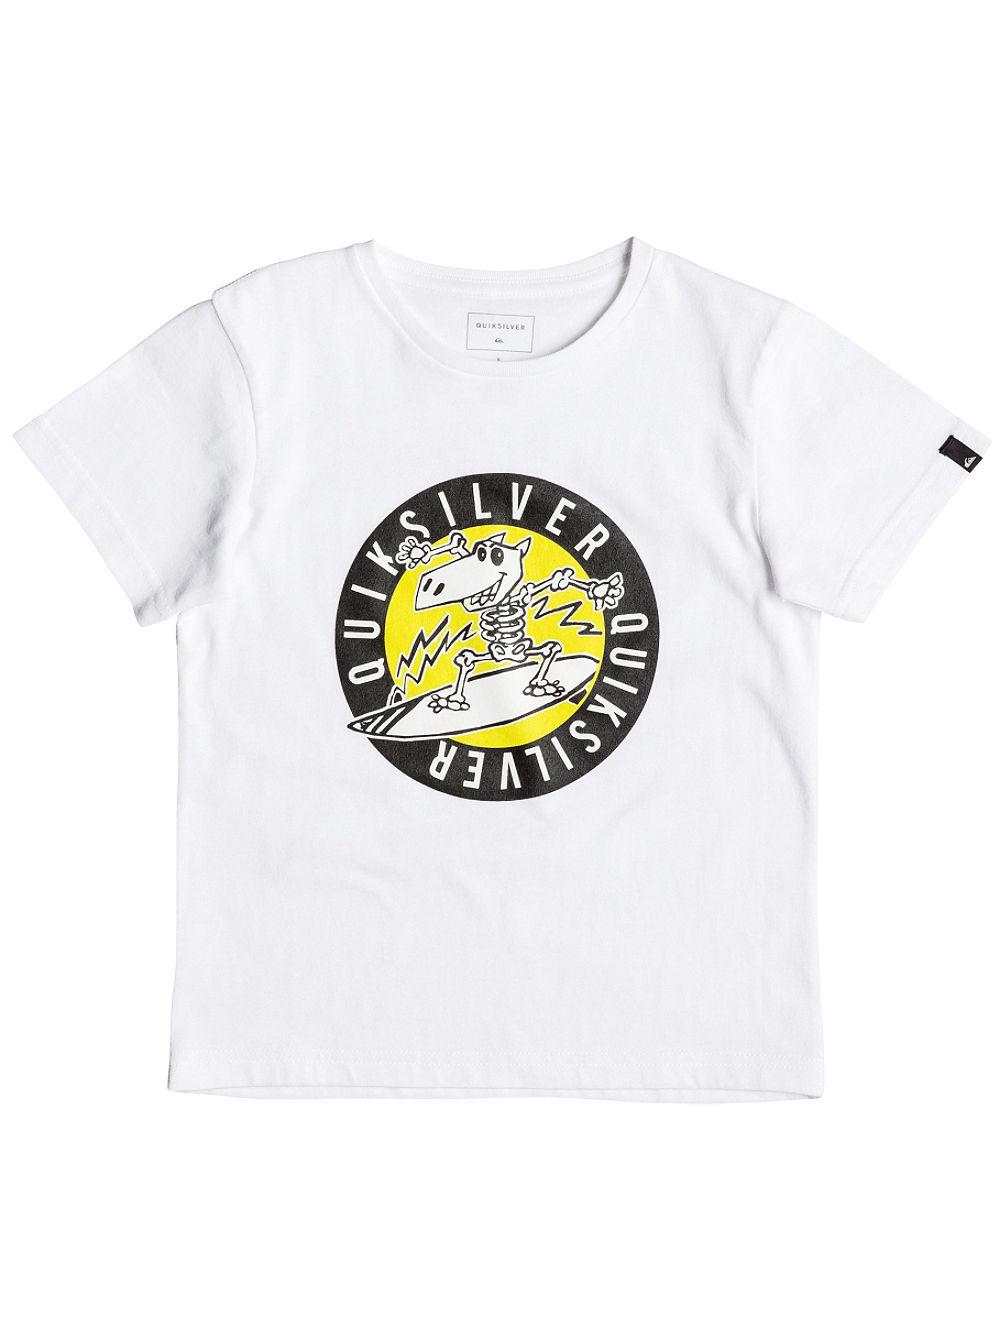 quiksilver-balou-t-shirt-boys